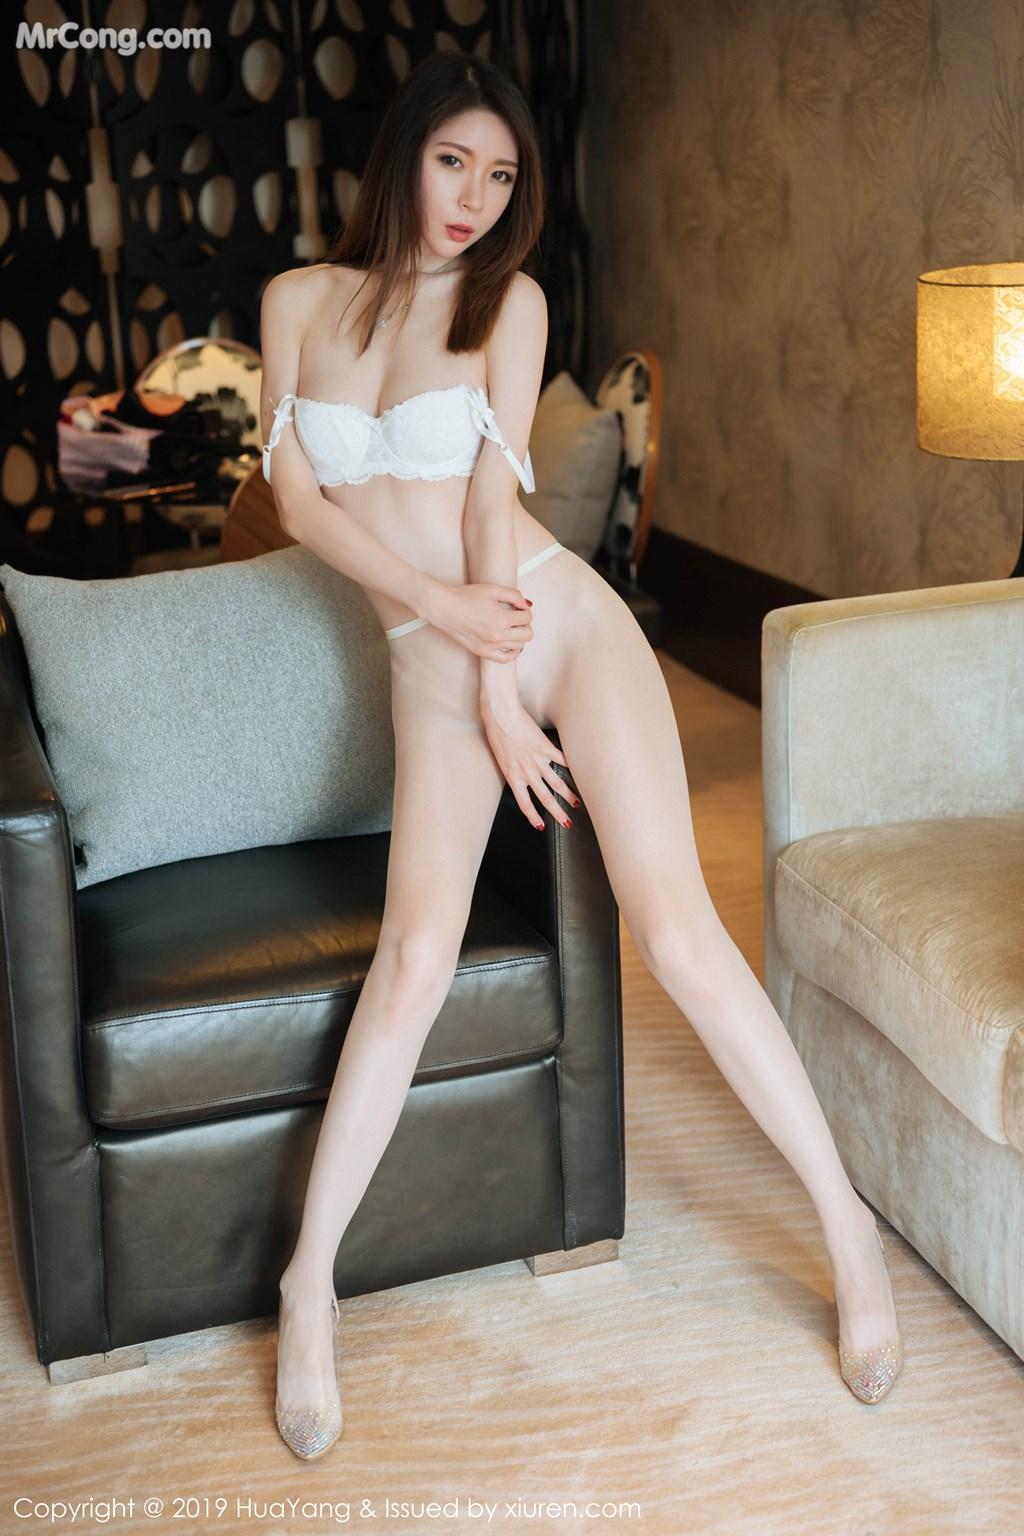 Image HuaYang-Vol.170-Meng-Xin-Yue-MrCong.com-033 in post HuaYang Vol.170: Meng Xin Yue (梦心月) (61 ảnh)